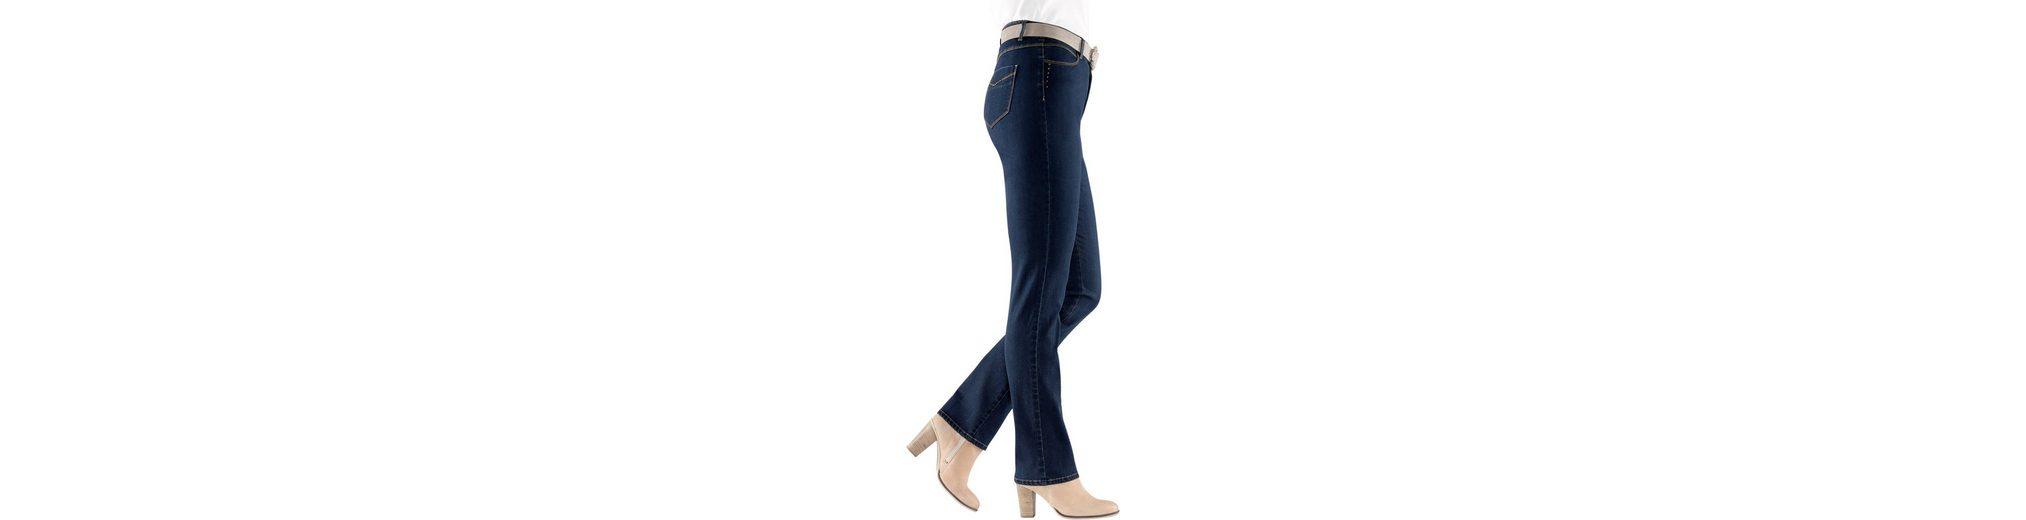 Collection L. Jeans mit Metallplättchen verziert Billig Offiziellen 4QdRF